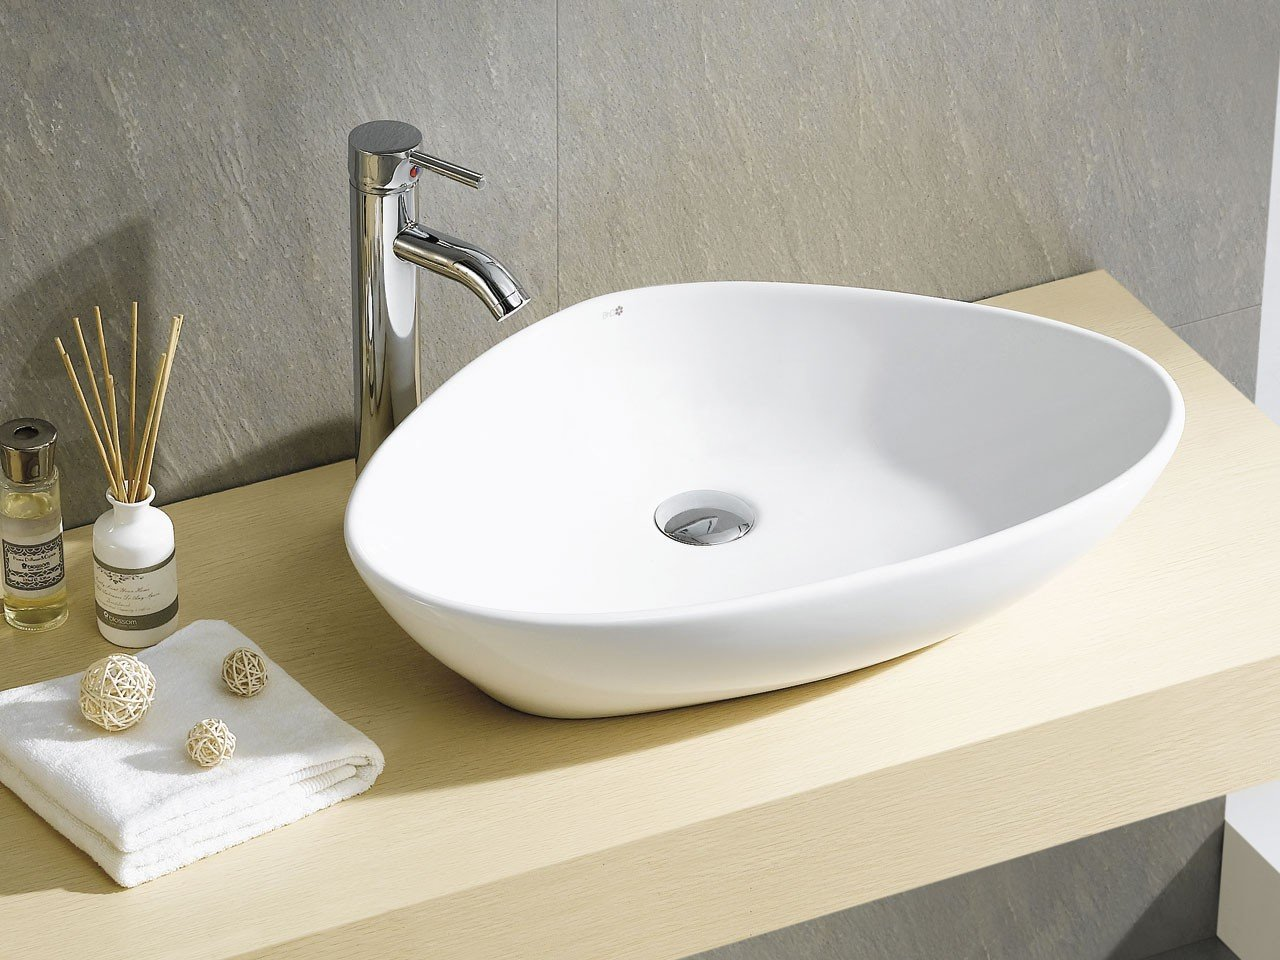 Lavabo d 39 arredo teruel 58 5x39 h14 ceram iperceramica - Lavabo bagno appoggio ...